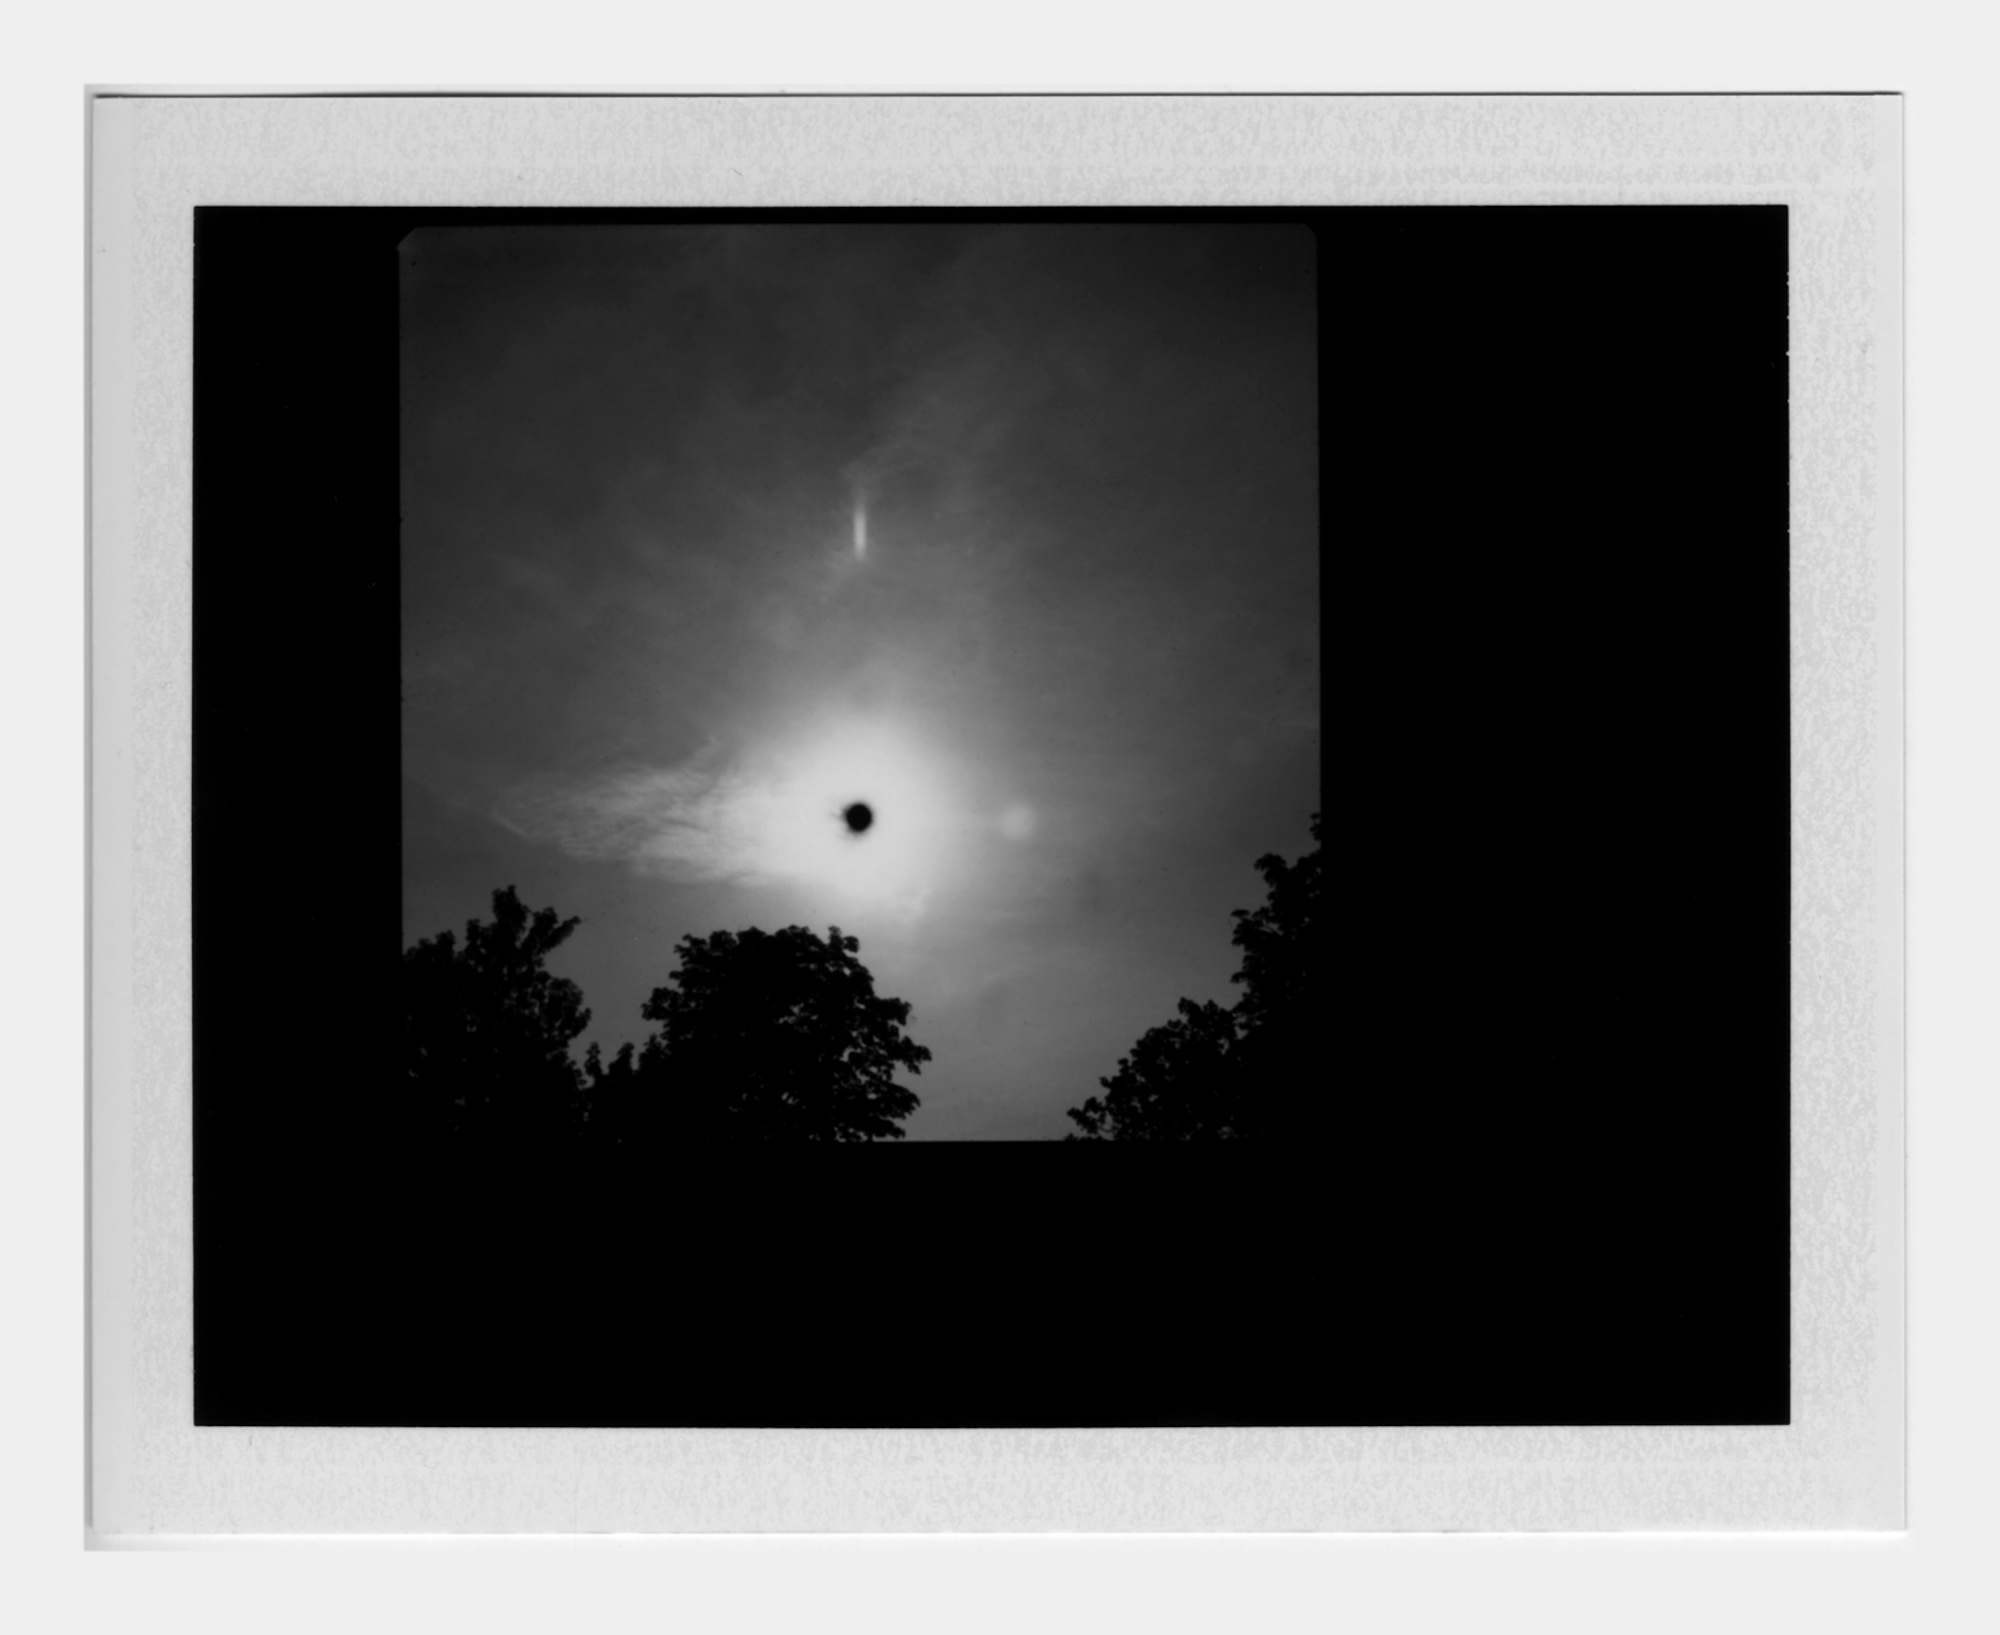 Michael John Whelan  Transit of Venus (2) 2012 Framed polaroid 22 x 24 cm